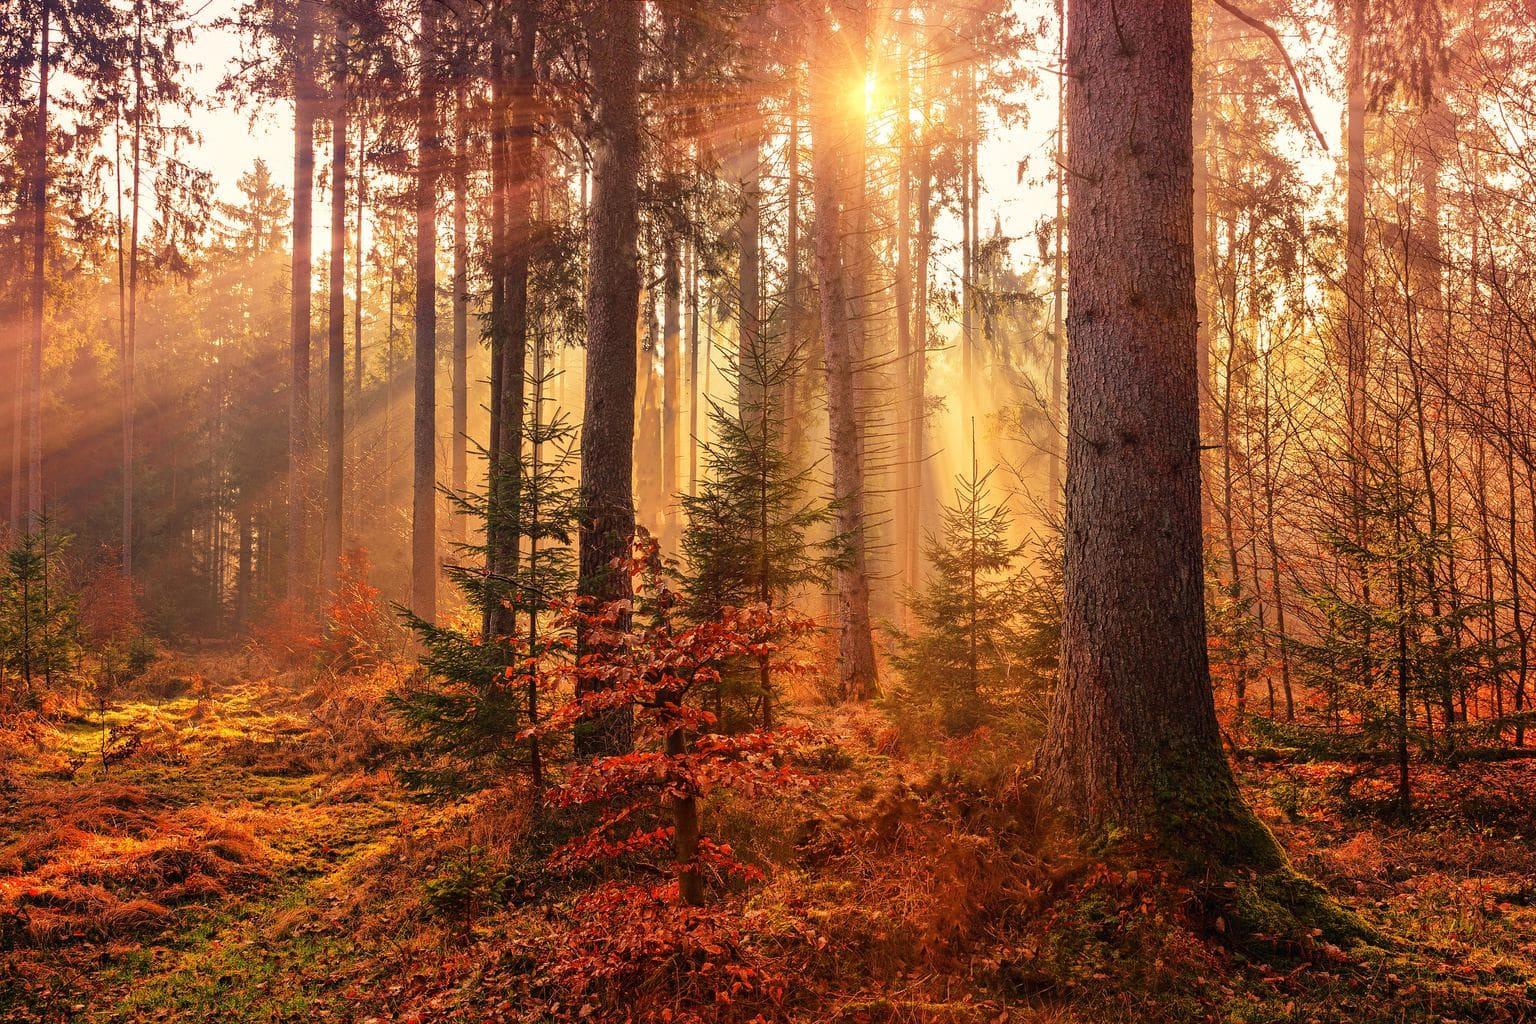 bosque atardecer paisaje